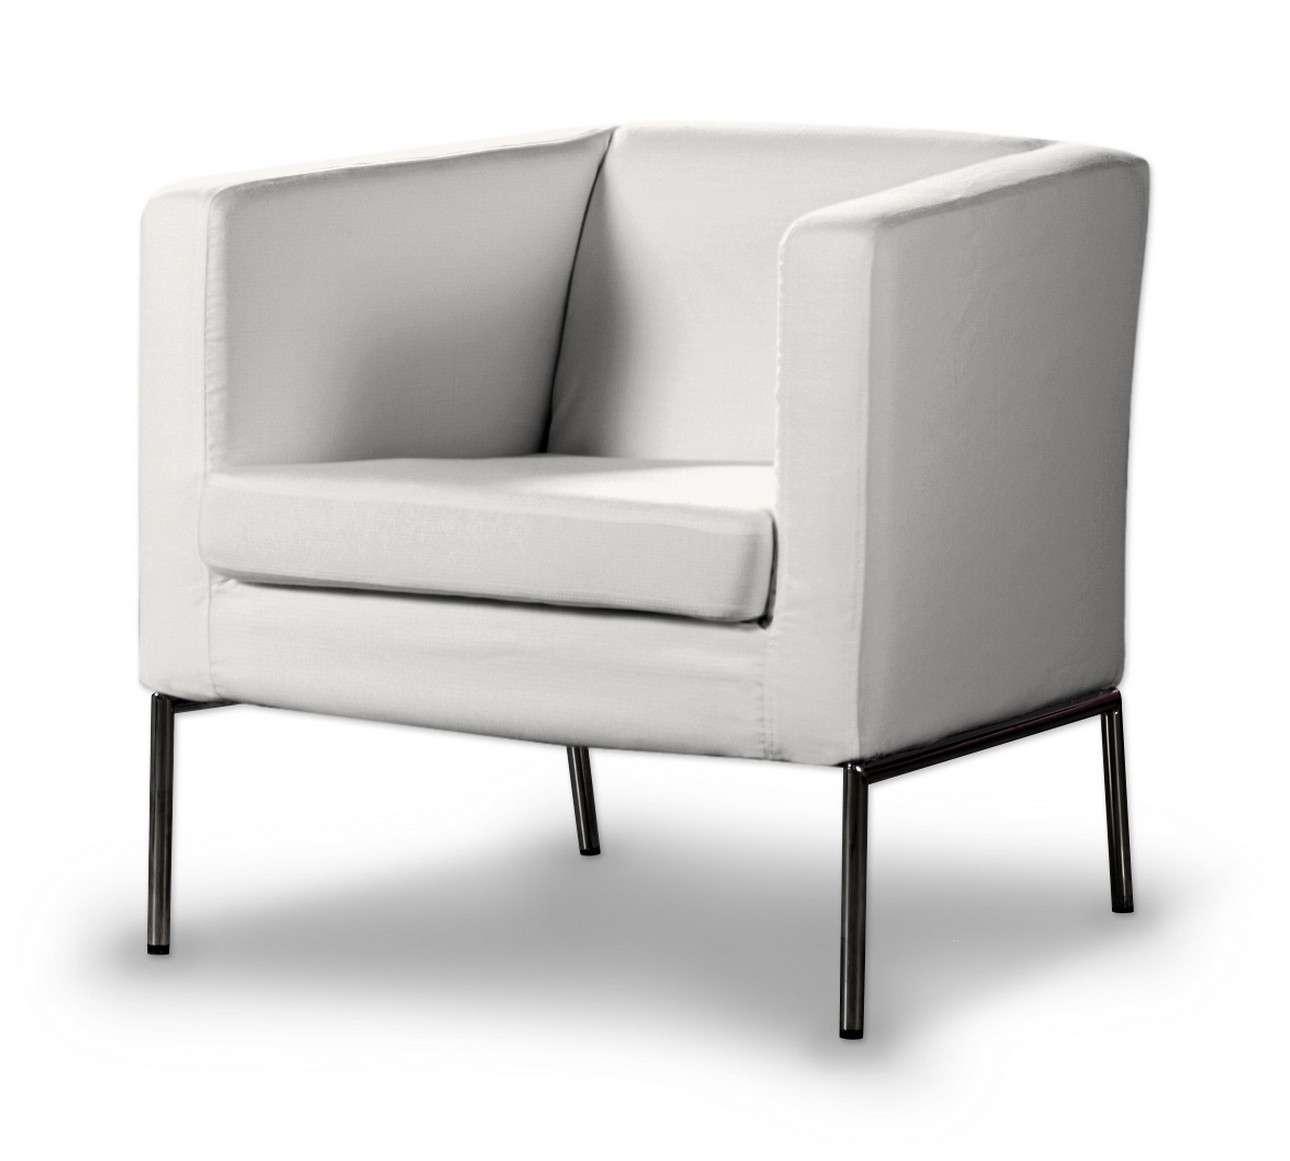 Phenomenal Klappsta Armchair Cover Inzonedesignstudio Interior Chair Design Inzonedesignstudiocom